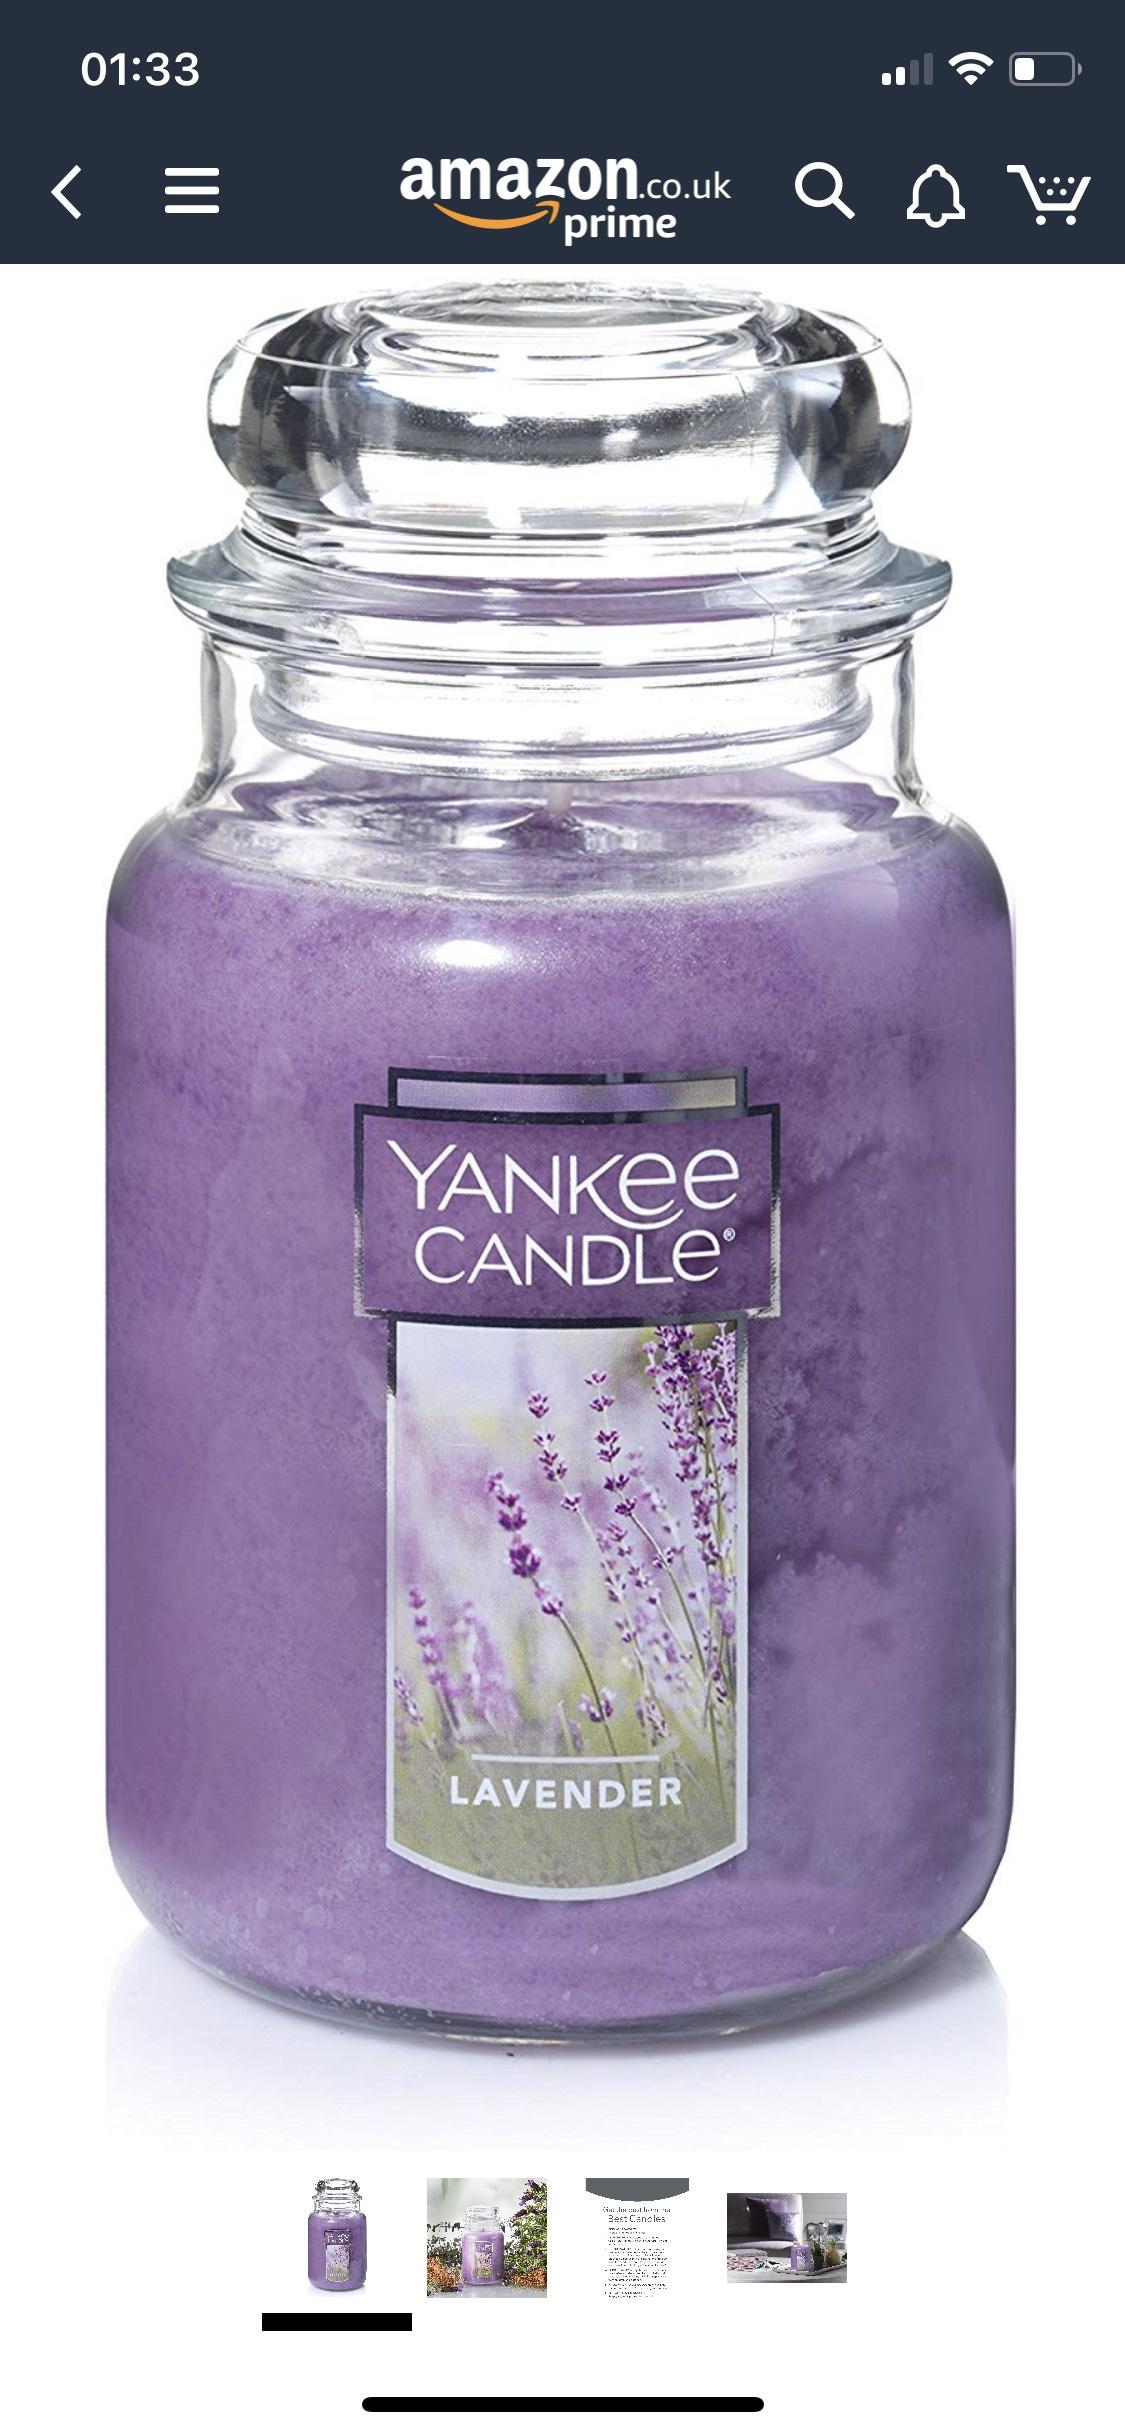 Yankee Candle Lavender Large Jar £11.27 delivered at Amazon global